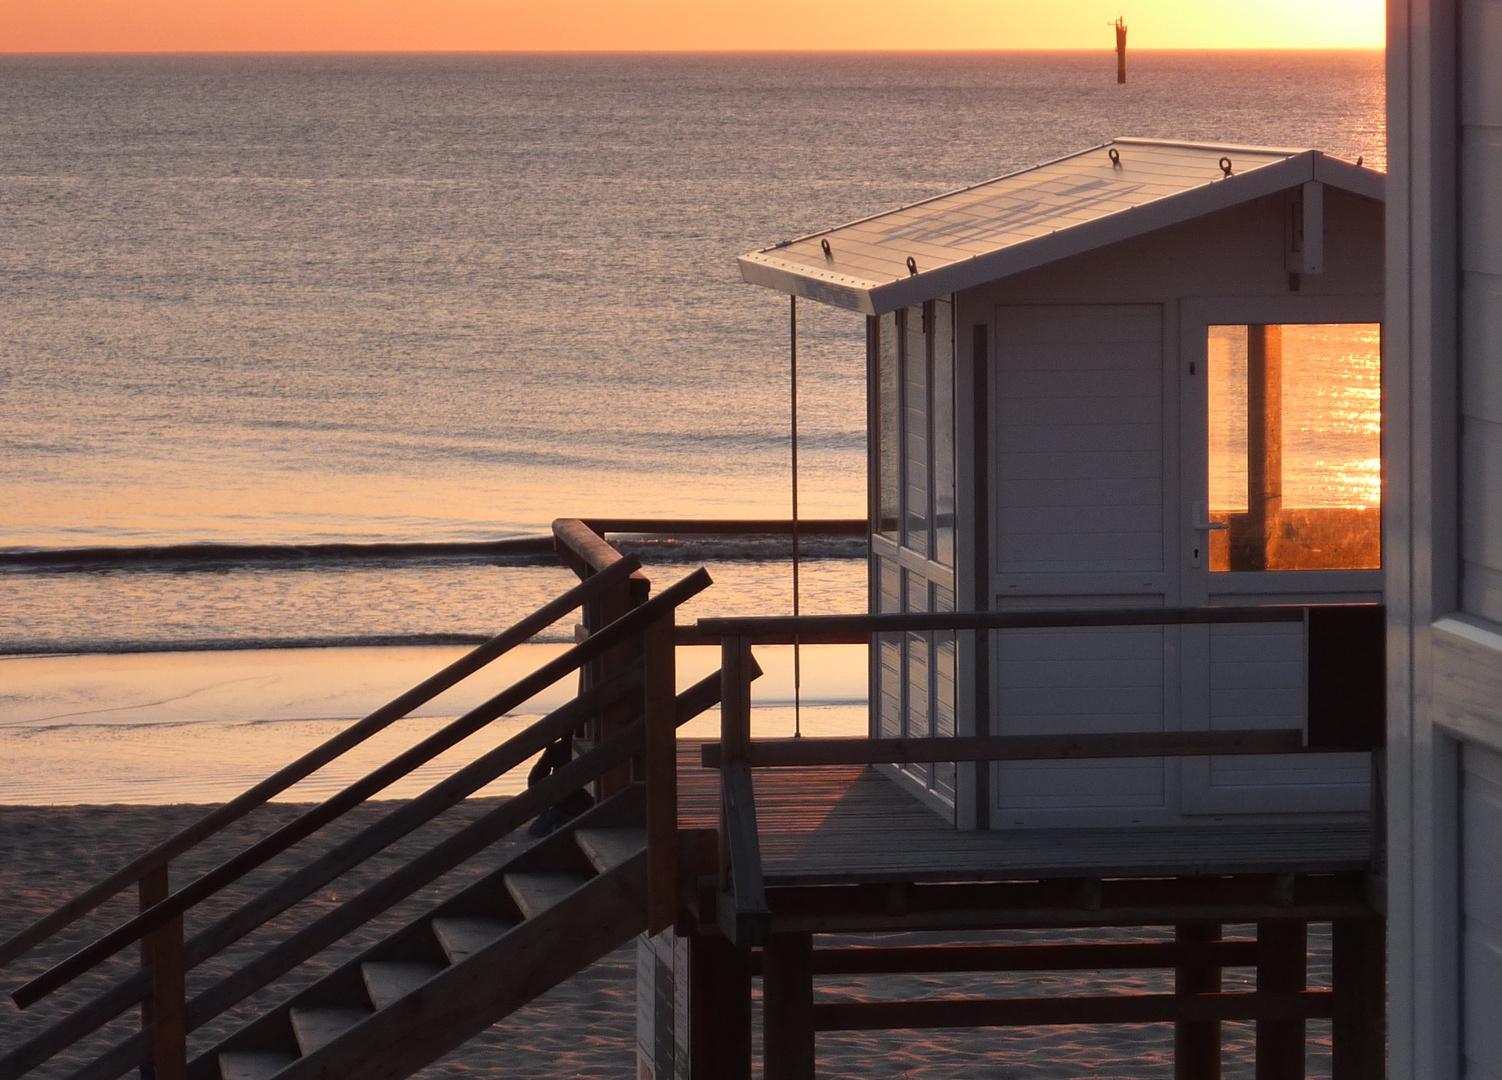 Strandhaus in der Abendsonne